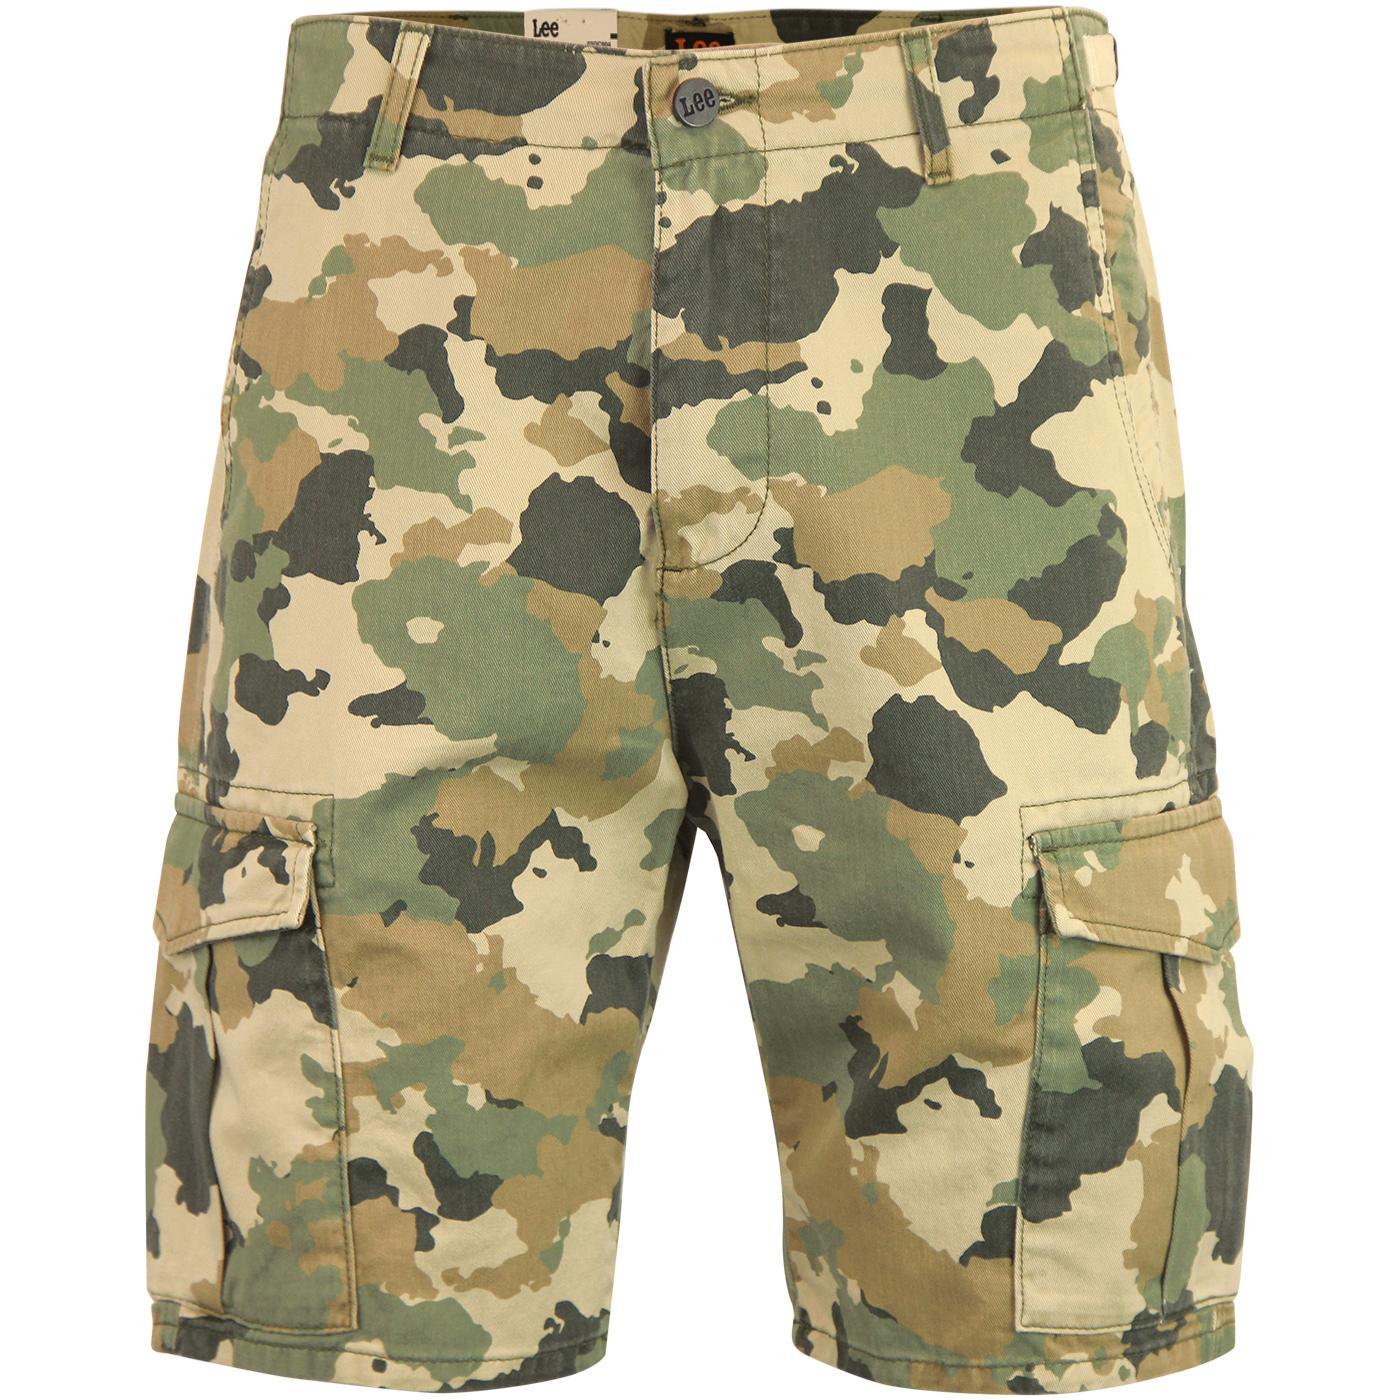 LEE JEANS Retro Military Camo Fatigue Shorts